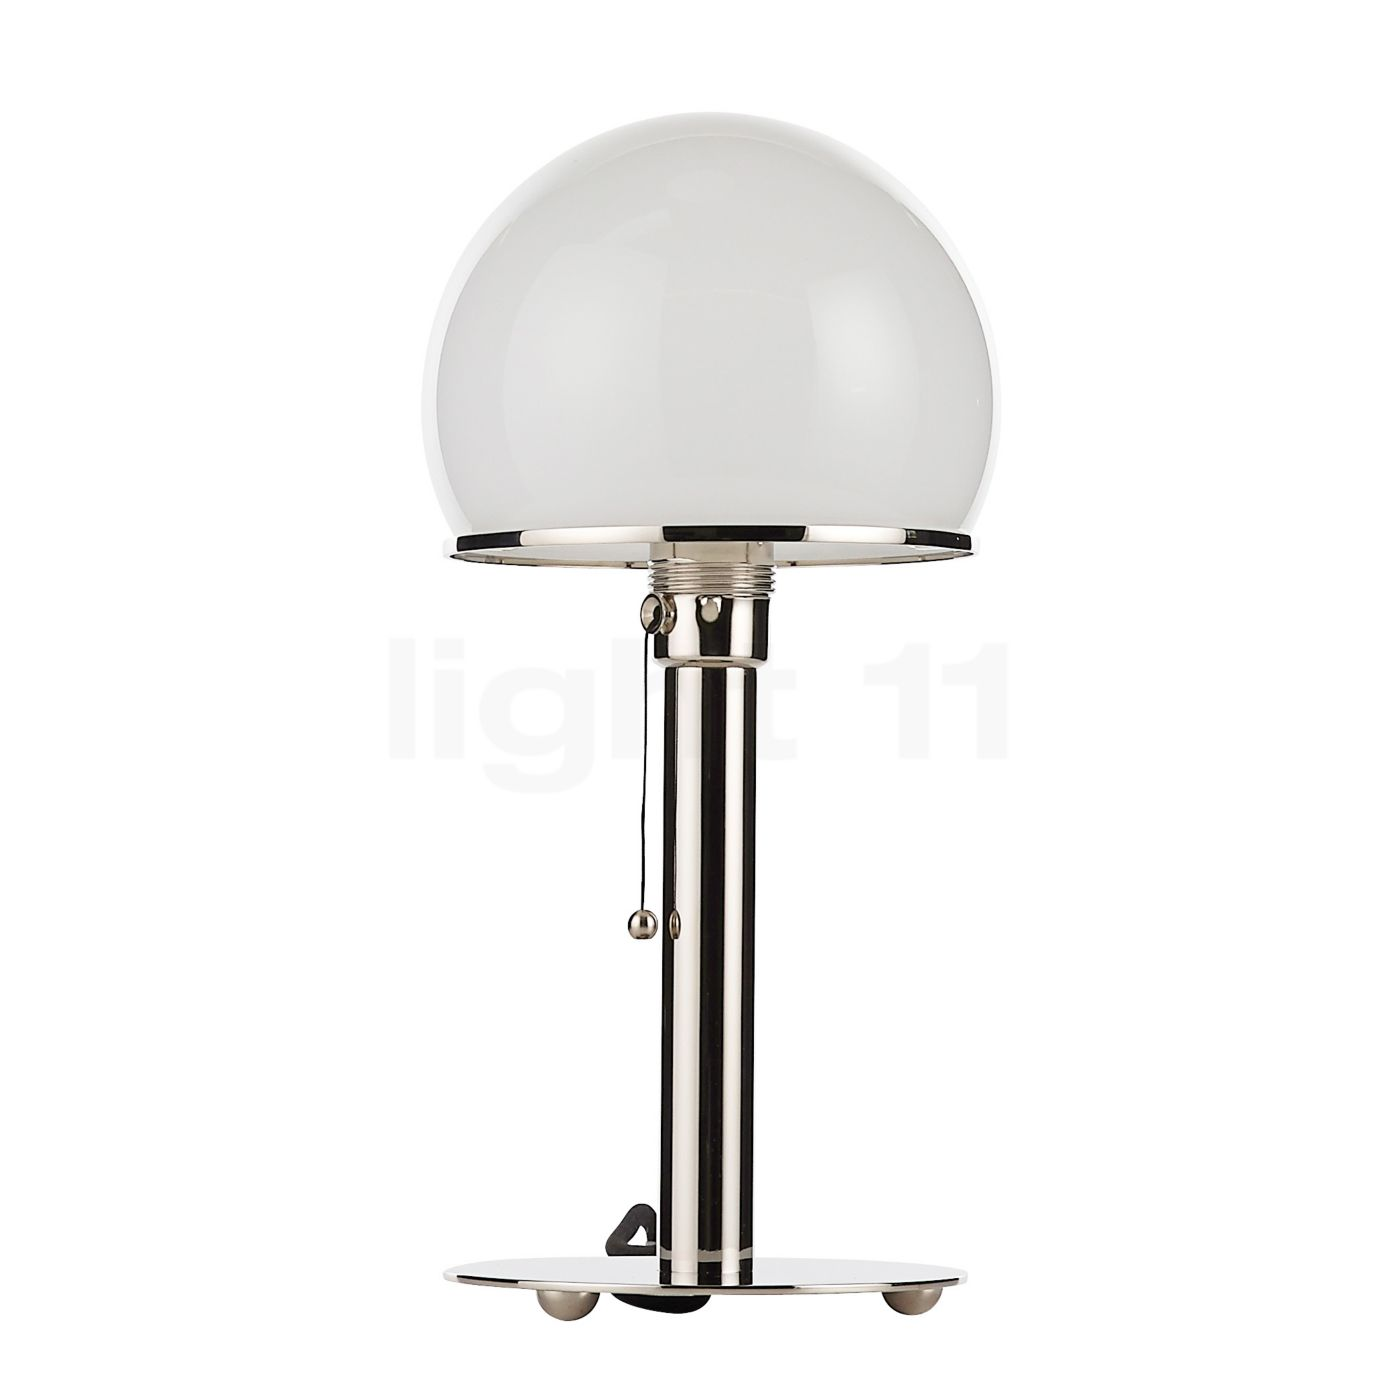 Tecnolumen wagenfeld wa 24 table lamp at light11 aloadofball Gallery